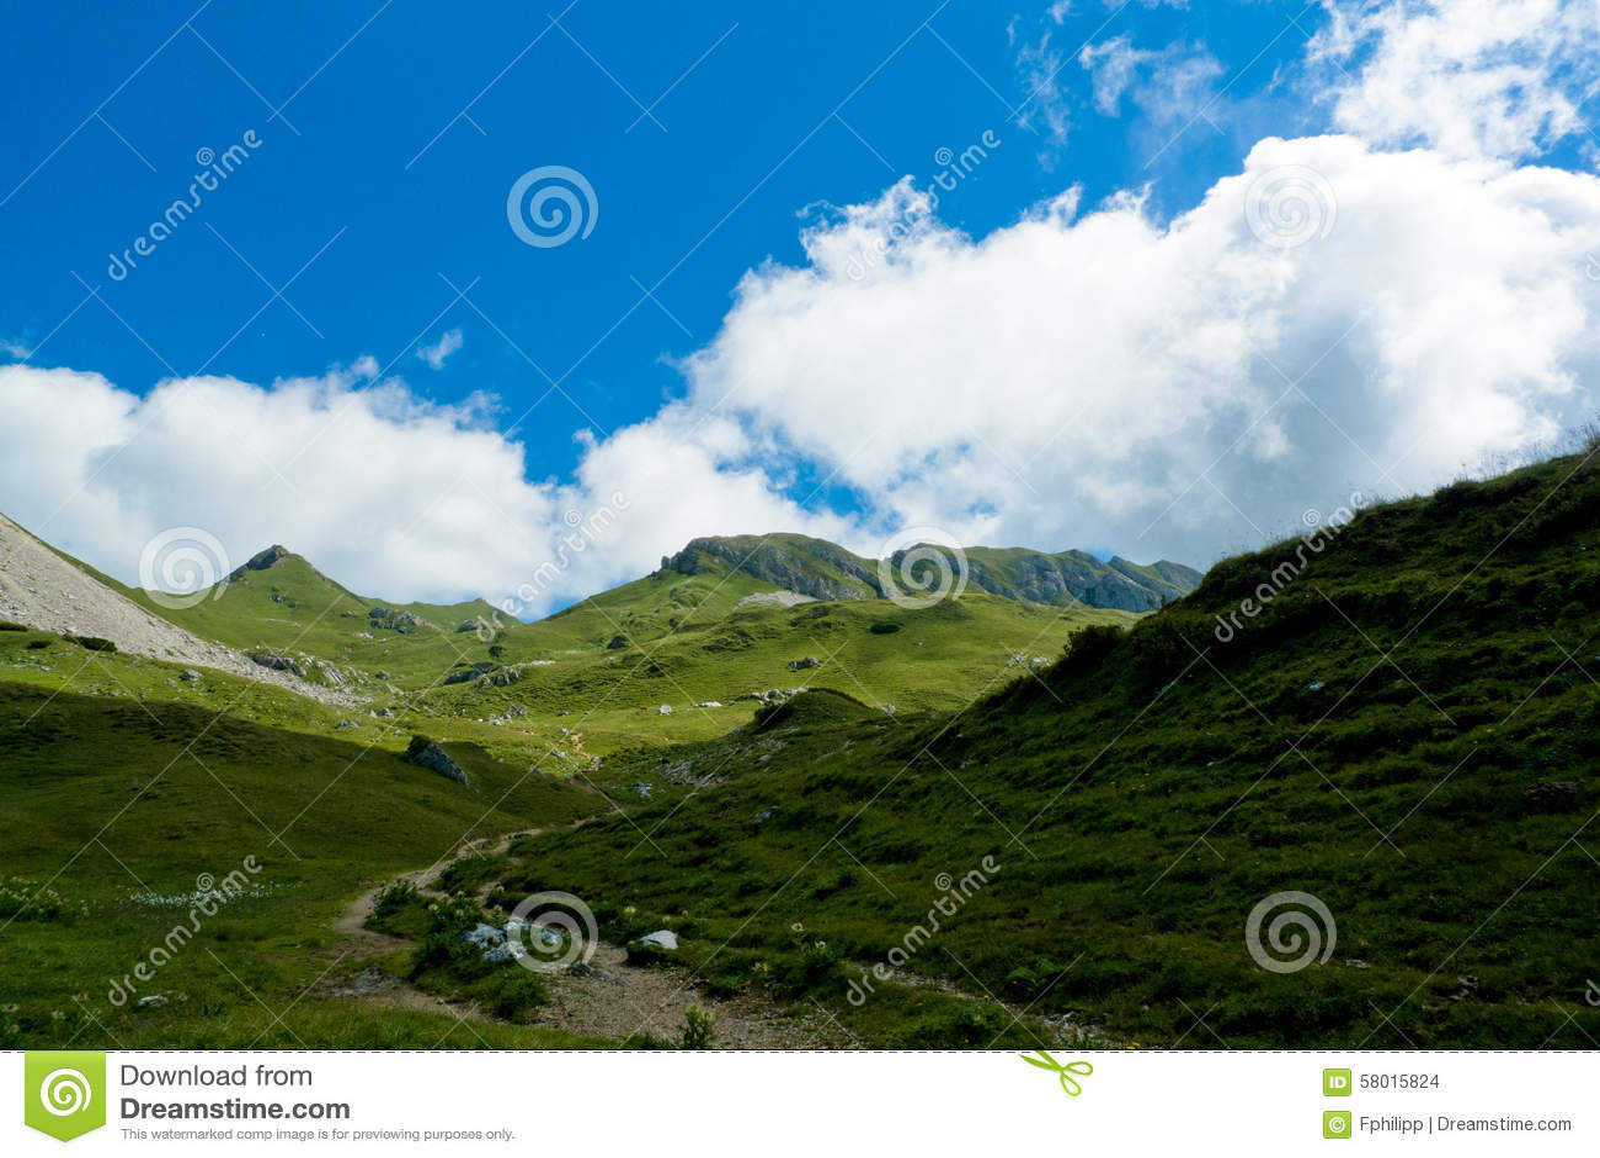 Paisagem alpina, cordilheira de Rofan, Áustria